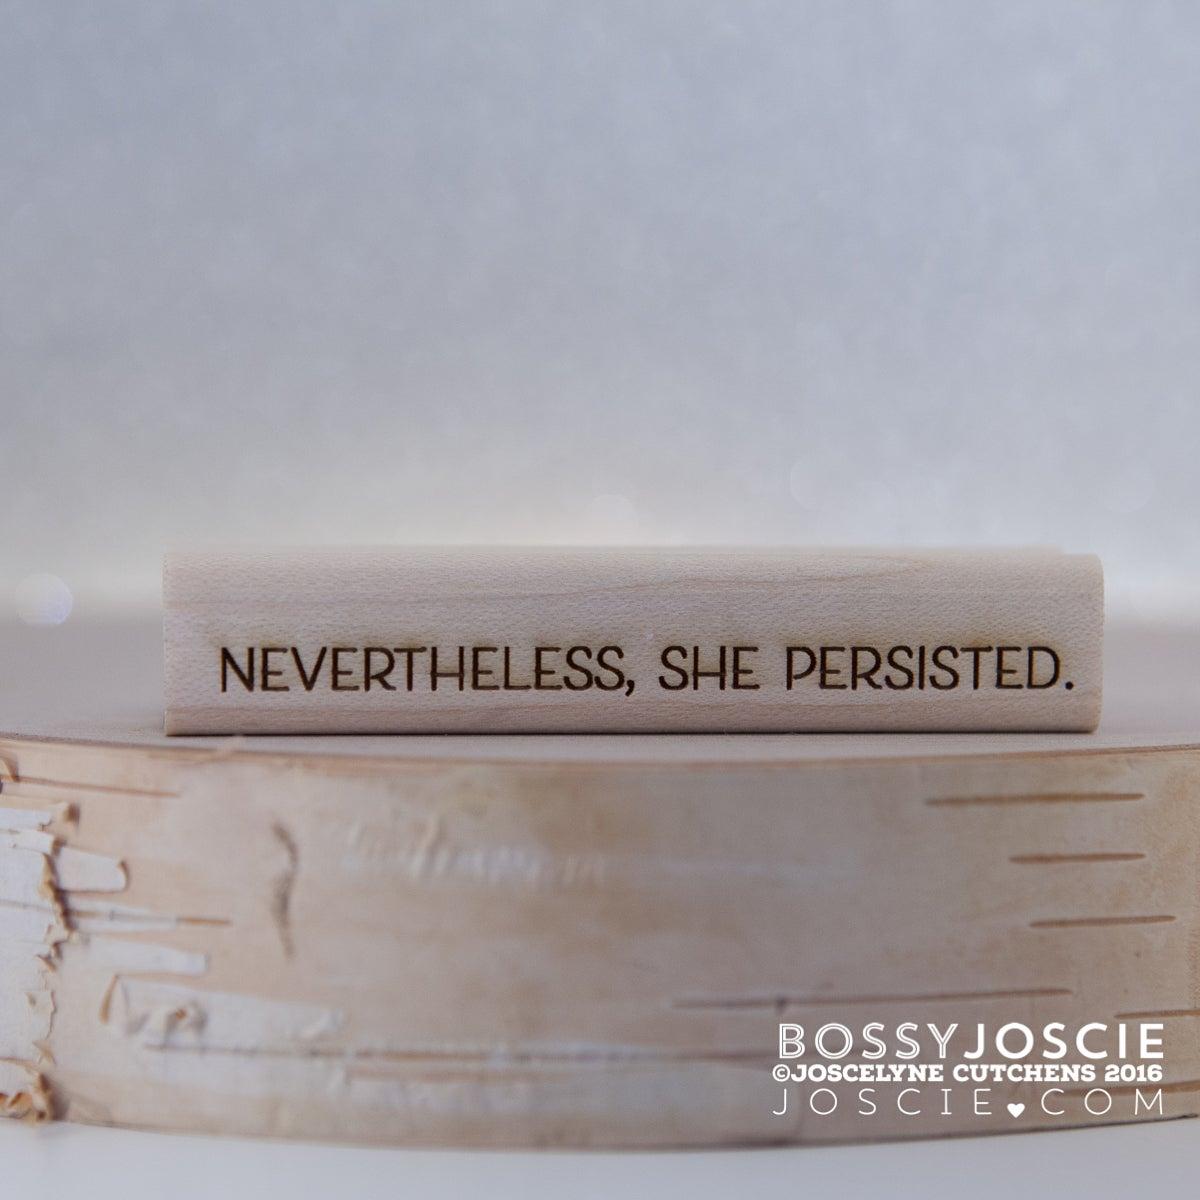 Bossy Joscie Nevertheless She Persisted